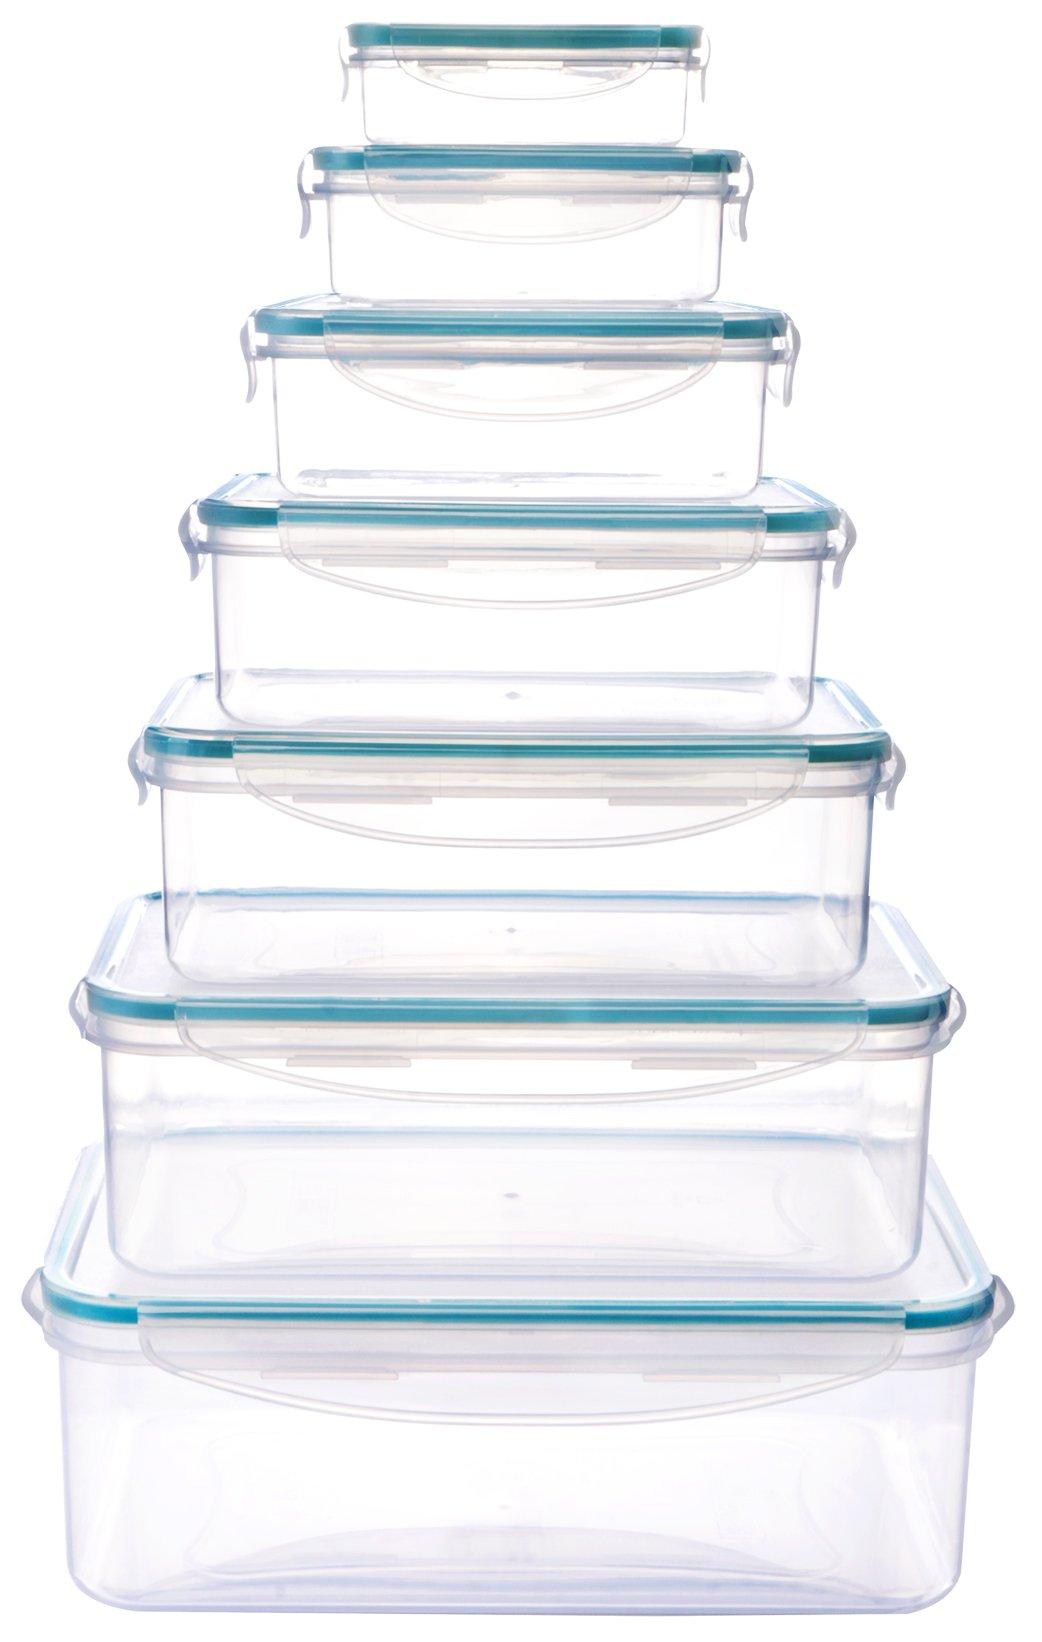 Plastic Food Storage Container Set (14 pieces - 7 containers u0026 7 lids) -  sc 1 st  TIBS & Plastic Food Storage Container Set (14 pieces - 7 containers u0026 7 ...